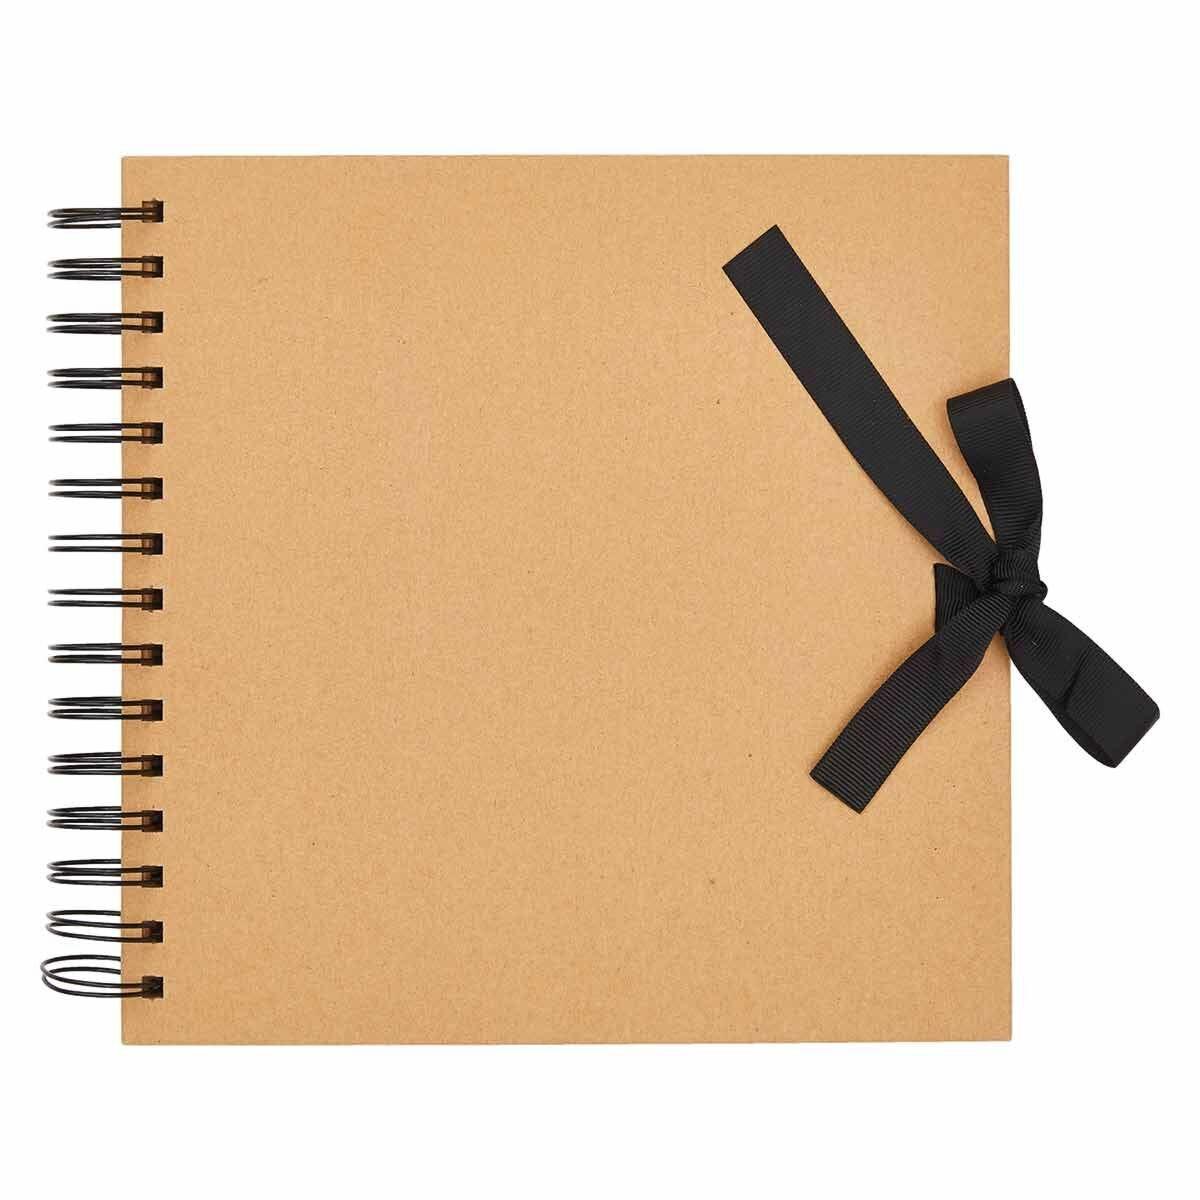 All Purpose Scrapbook with Ribbon Tie 8x8 Inch Kraft